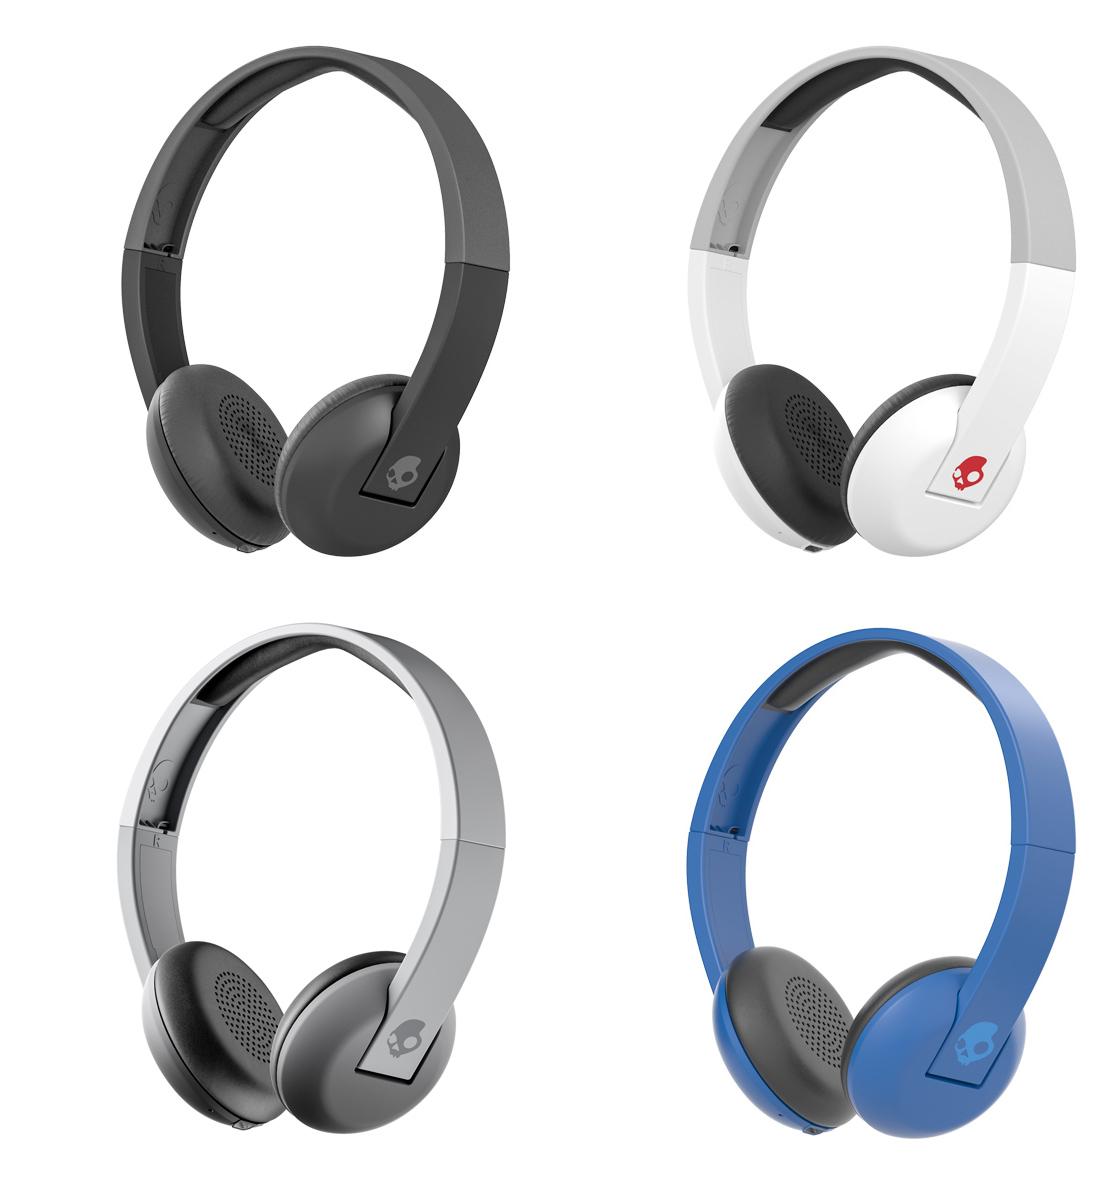 47b75c17ecb Sentinel Skullcandy Bluetooth Headphones - Uproar Wireless On-Ear -  Microphone, Smartphon